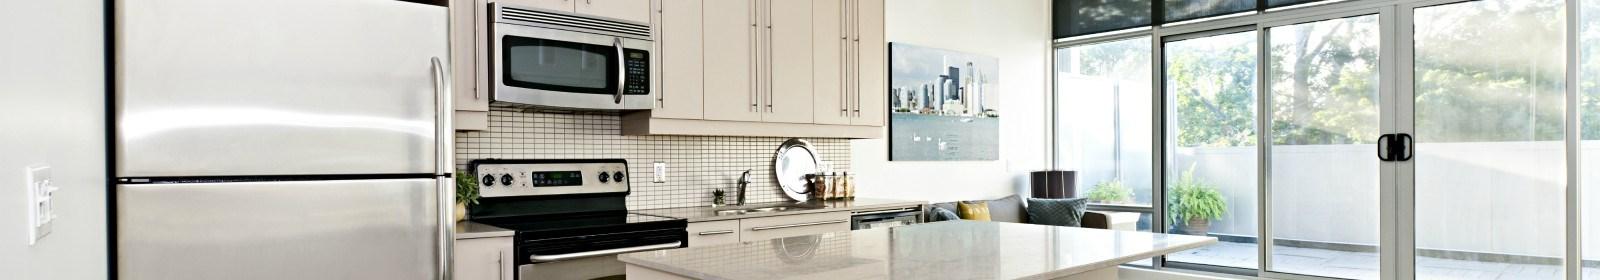 Budget-friendly kitchen renovation tips